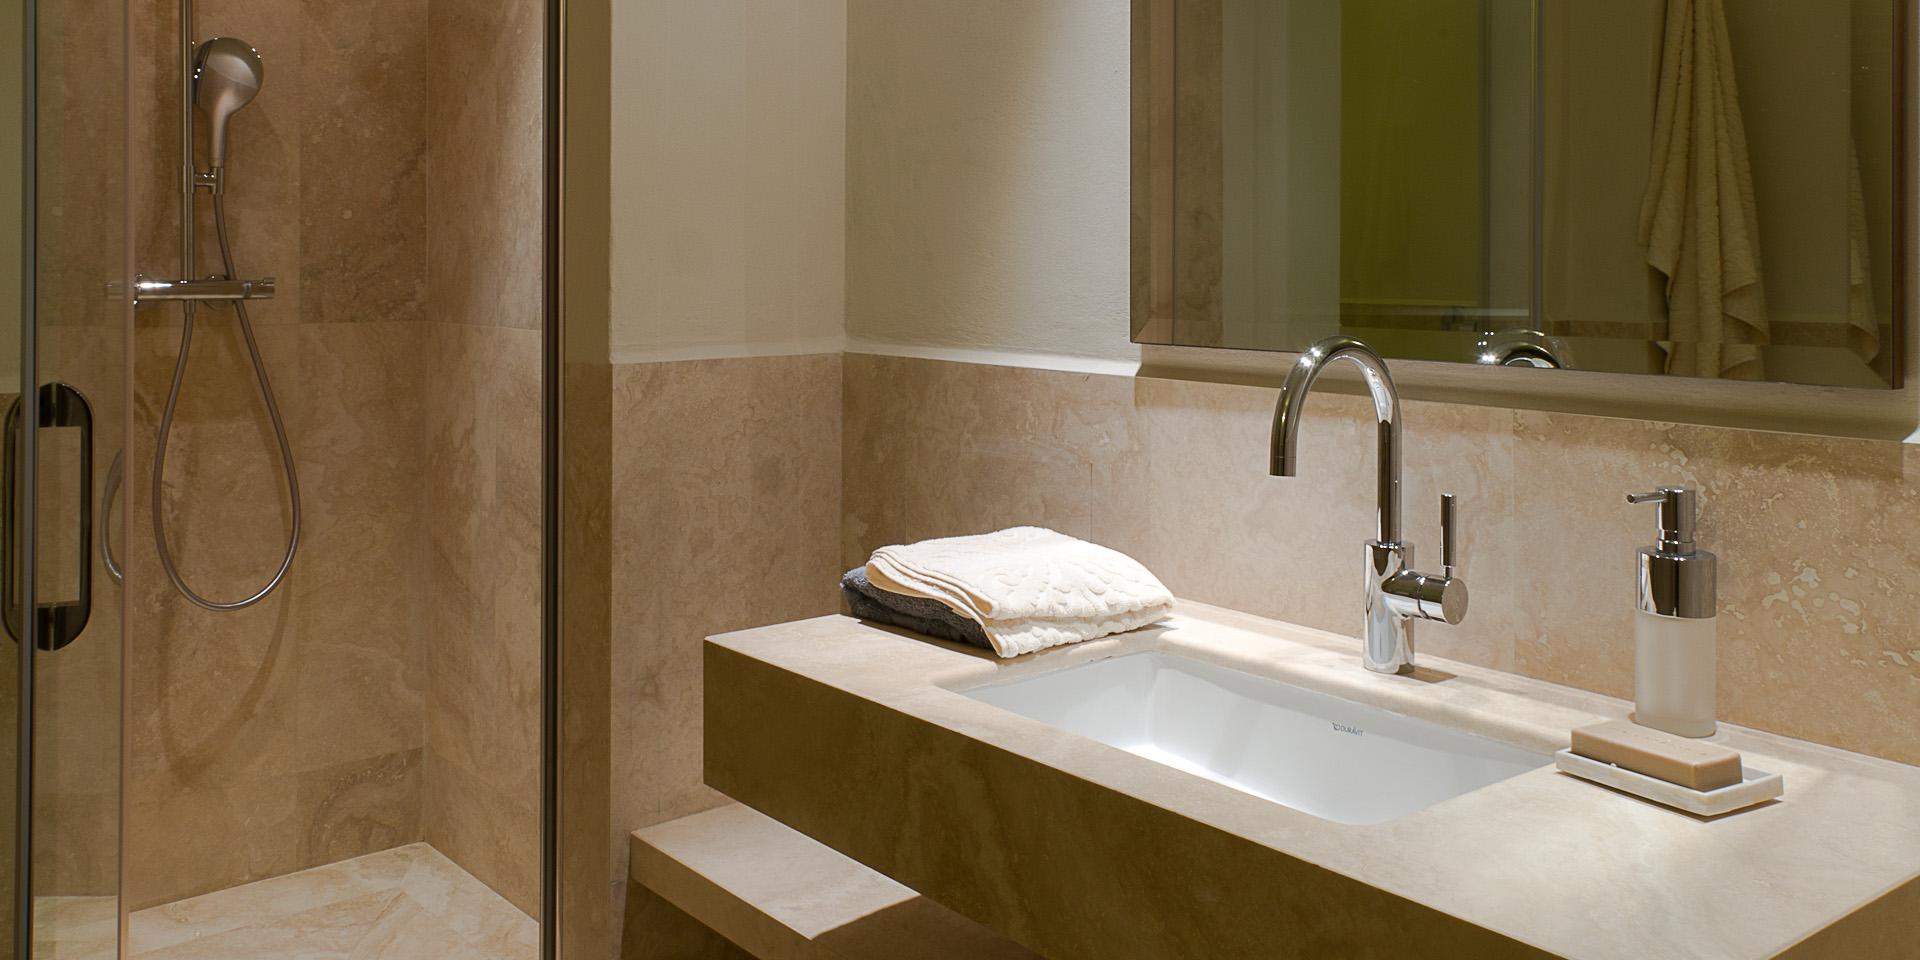 Bad mit dusche aus hellem travertin pietre di rapolano - Pietre per bagno ...